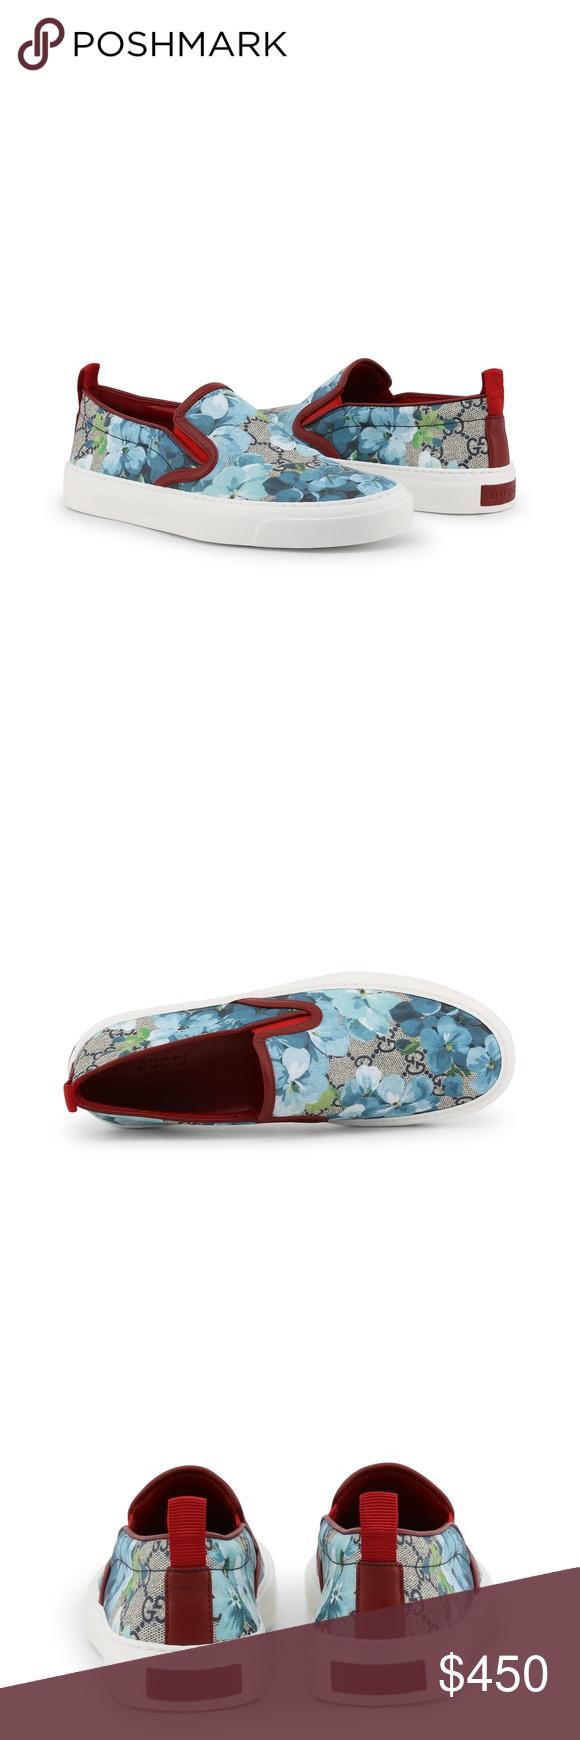 24f040560 NWT Gucci Supreme GG Canvas Bloom Slip On Sneakers 100% Authentic Gucci  Womens Supreme GG